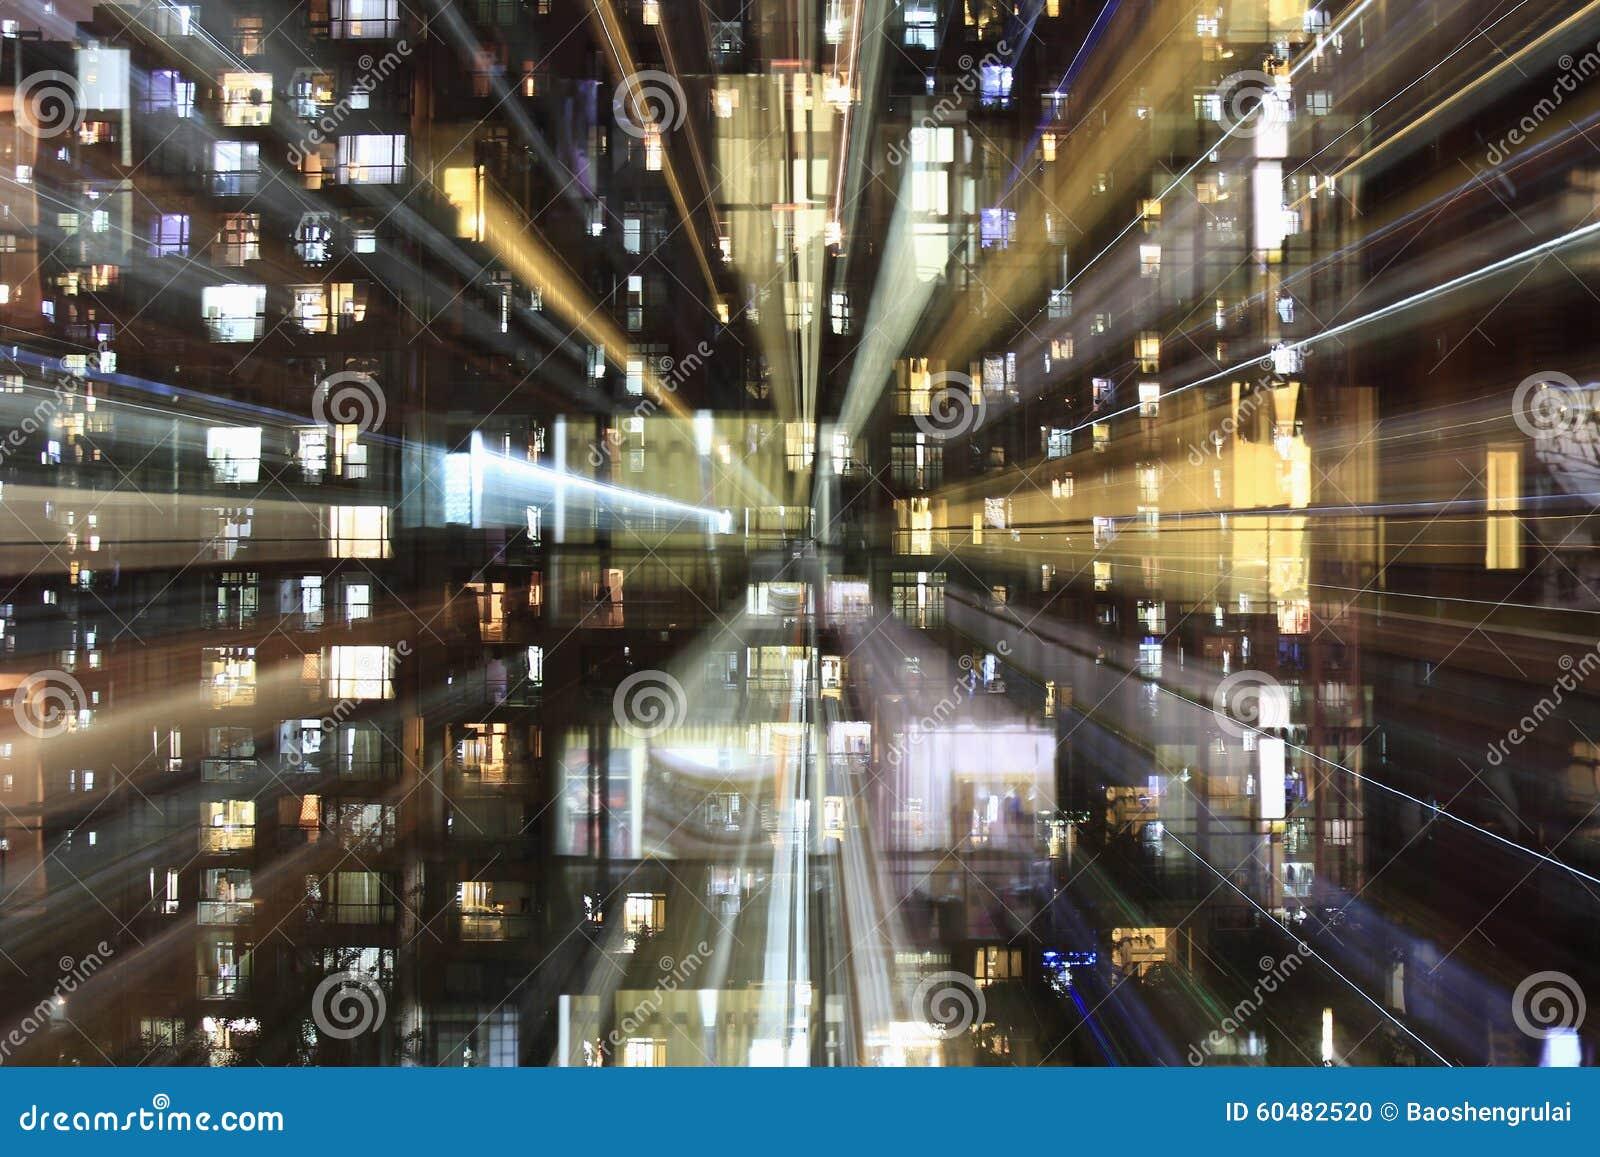 Optical network epoch